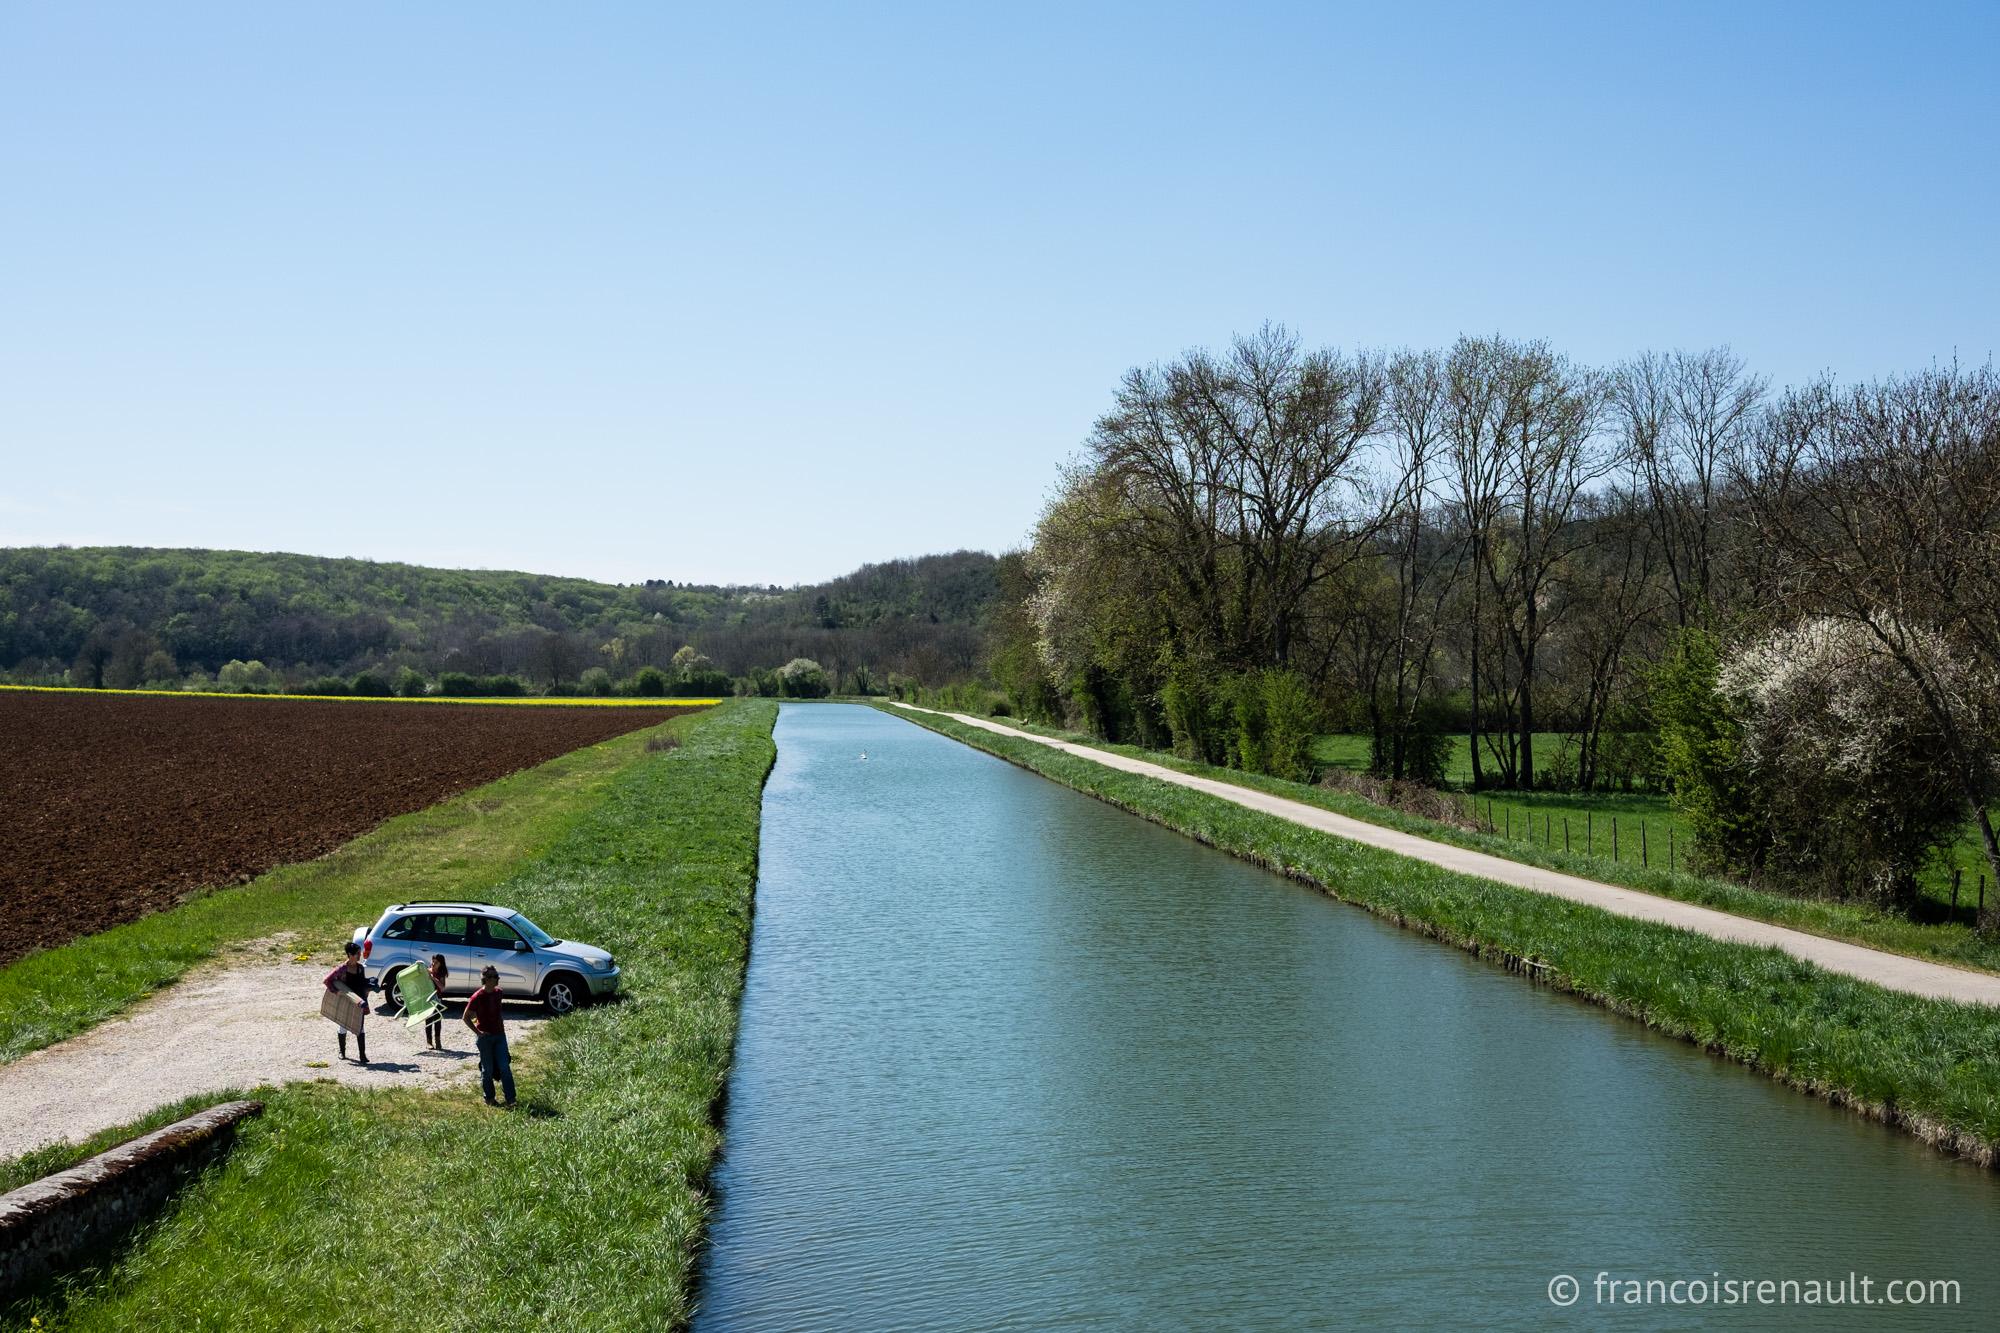 Canal-Nivernais-Francois-Renault-09